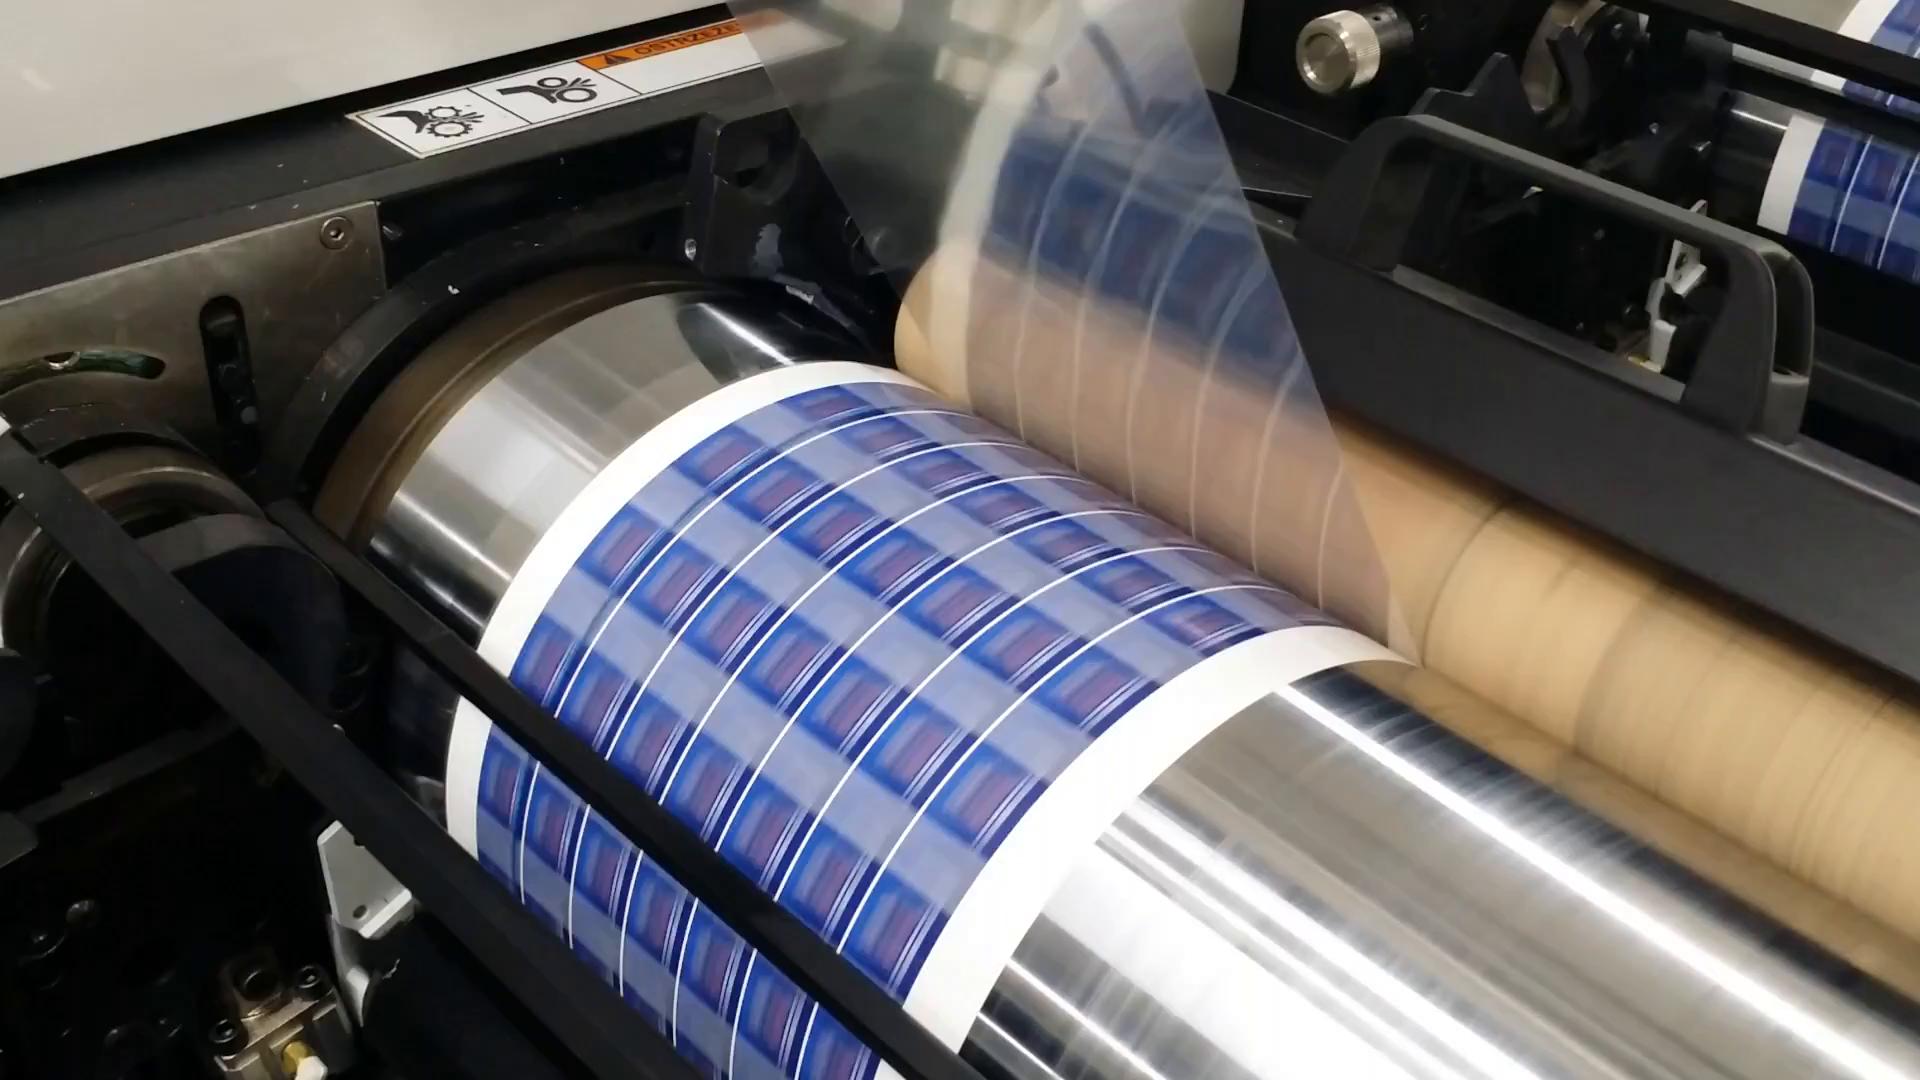 drukarnia cyfrowa producent etykiet